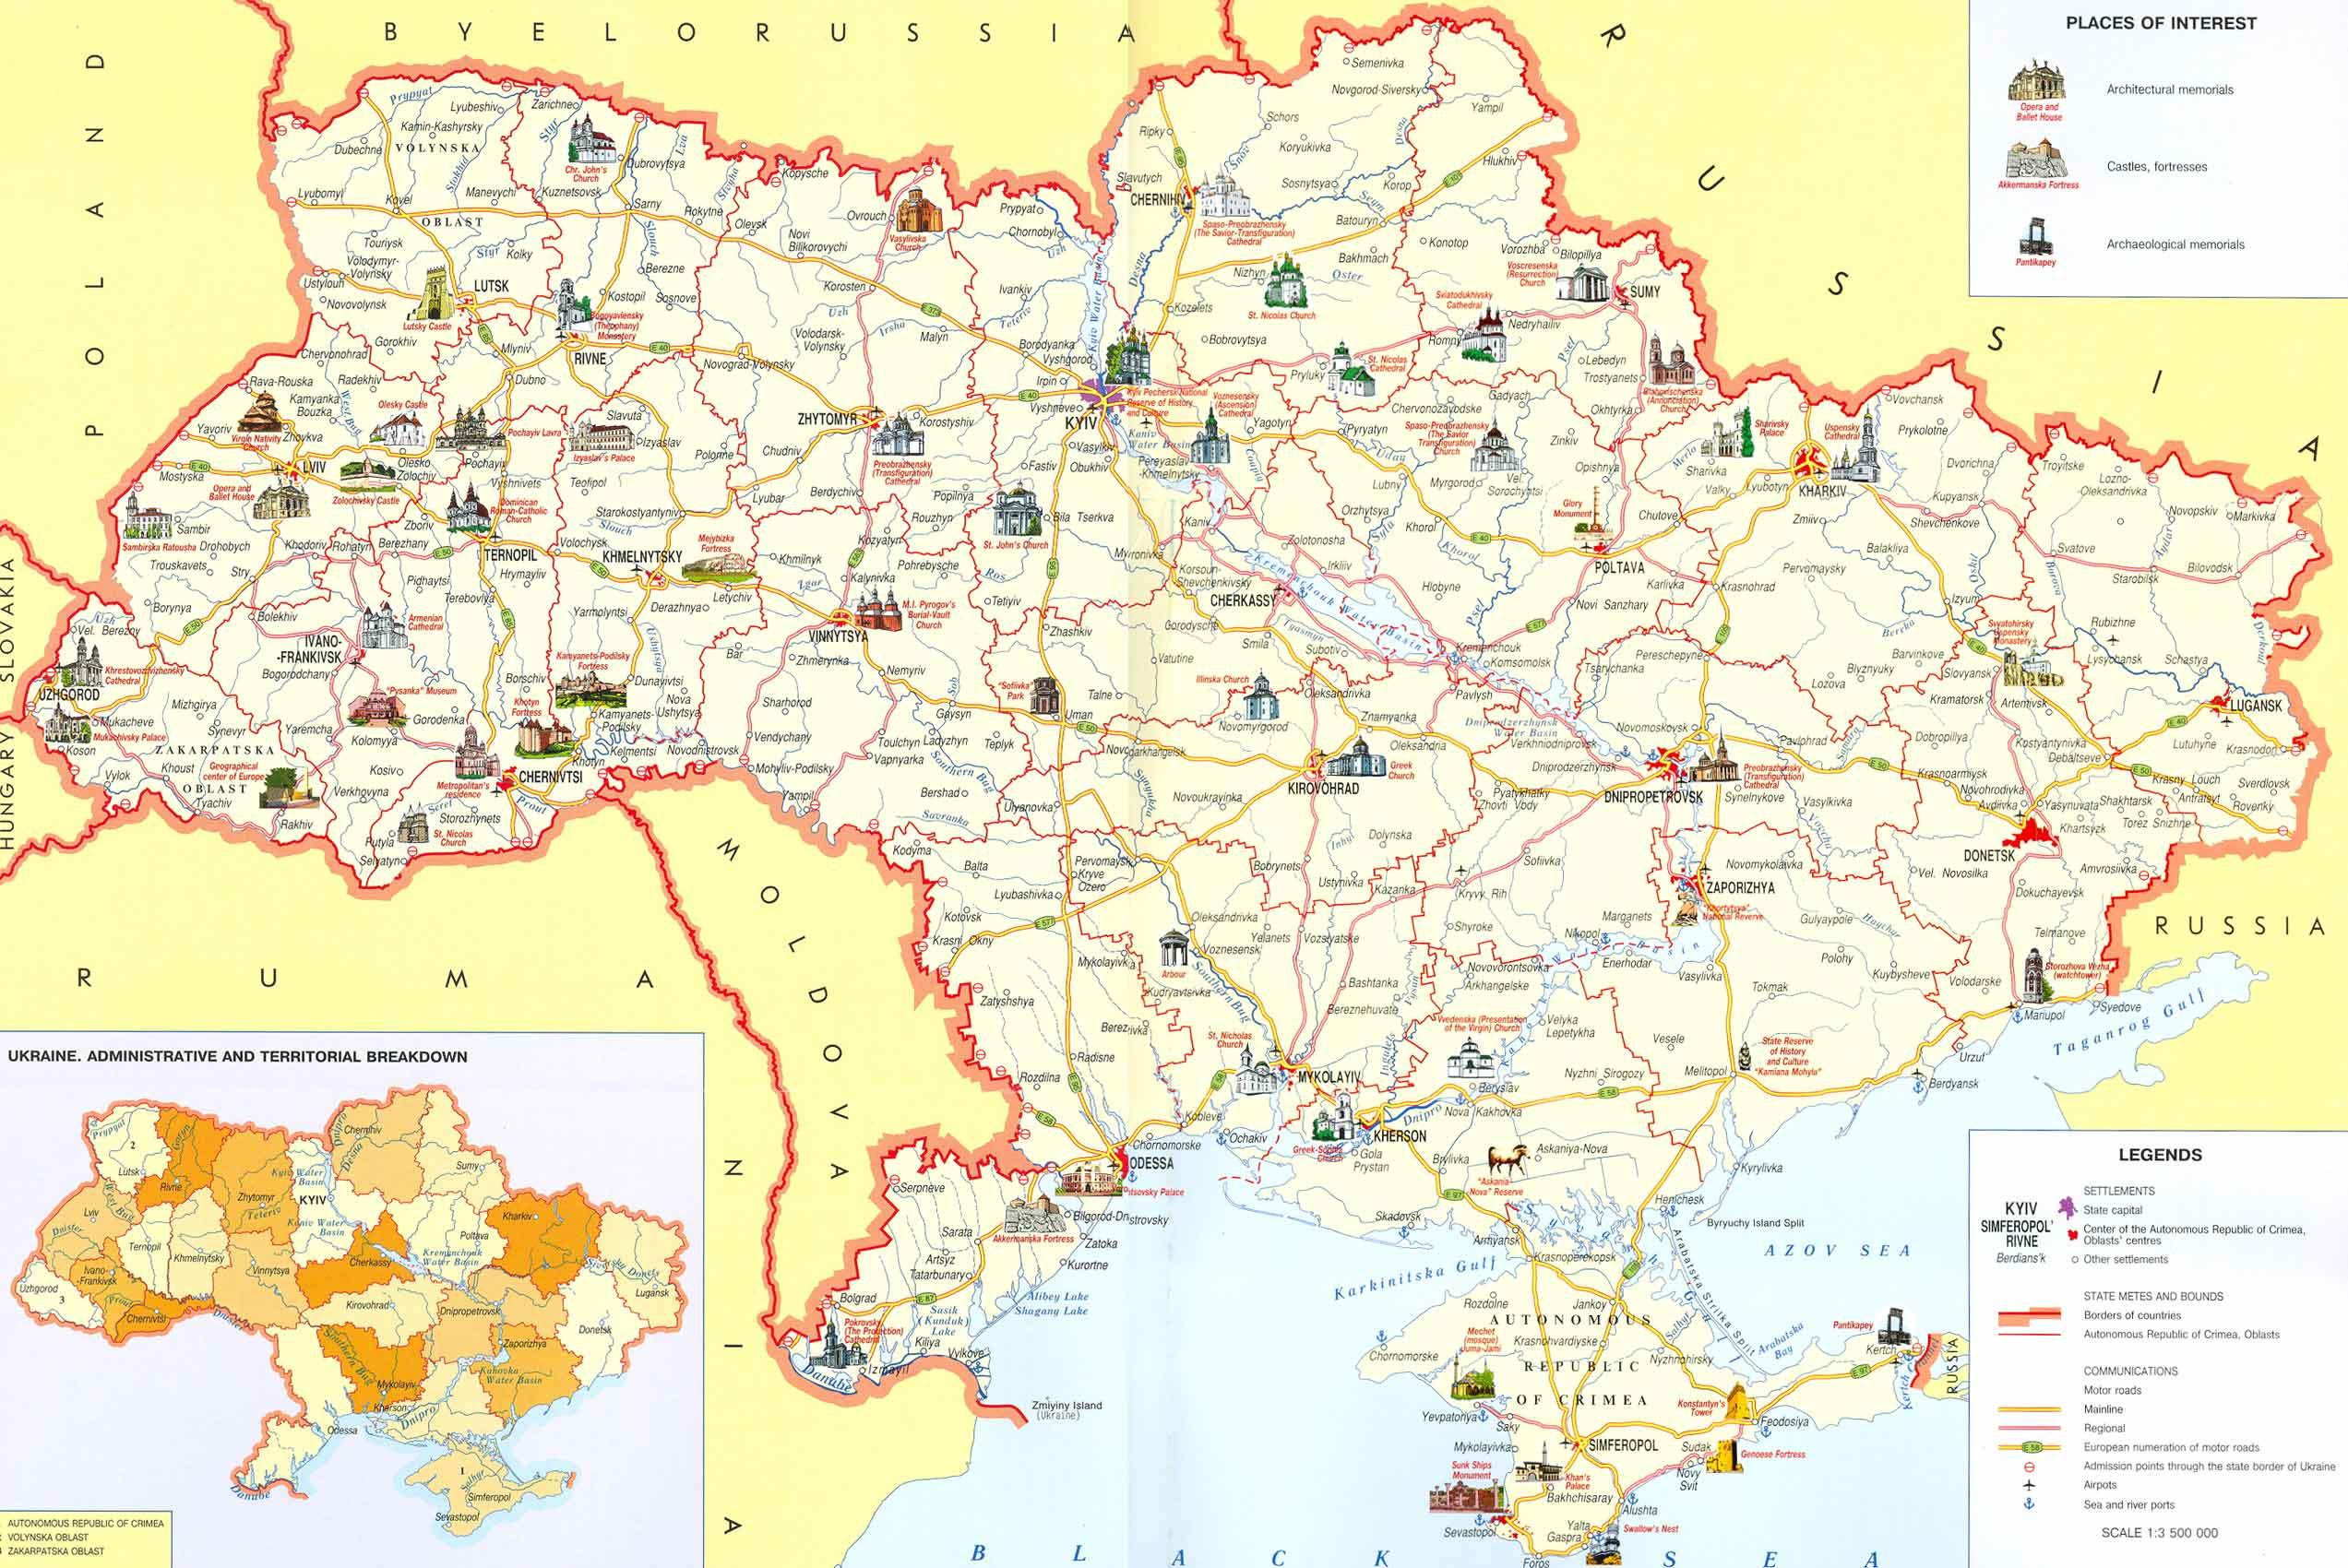 Mapa Turístico Ucrânia